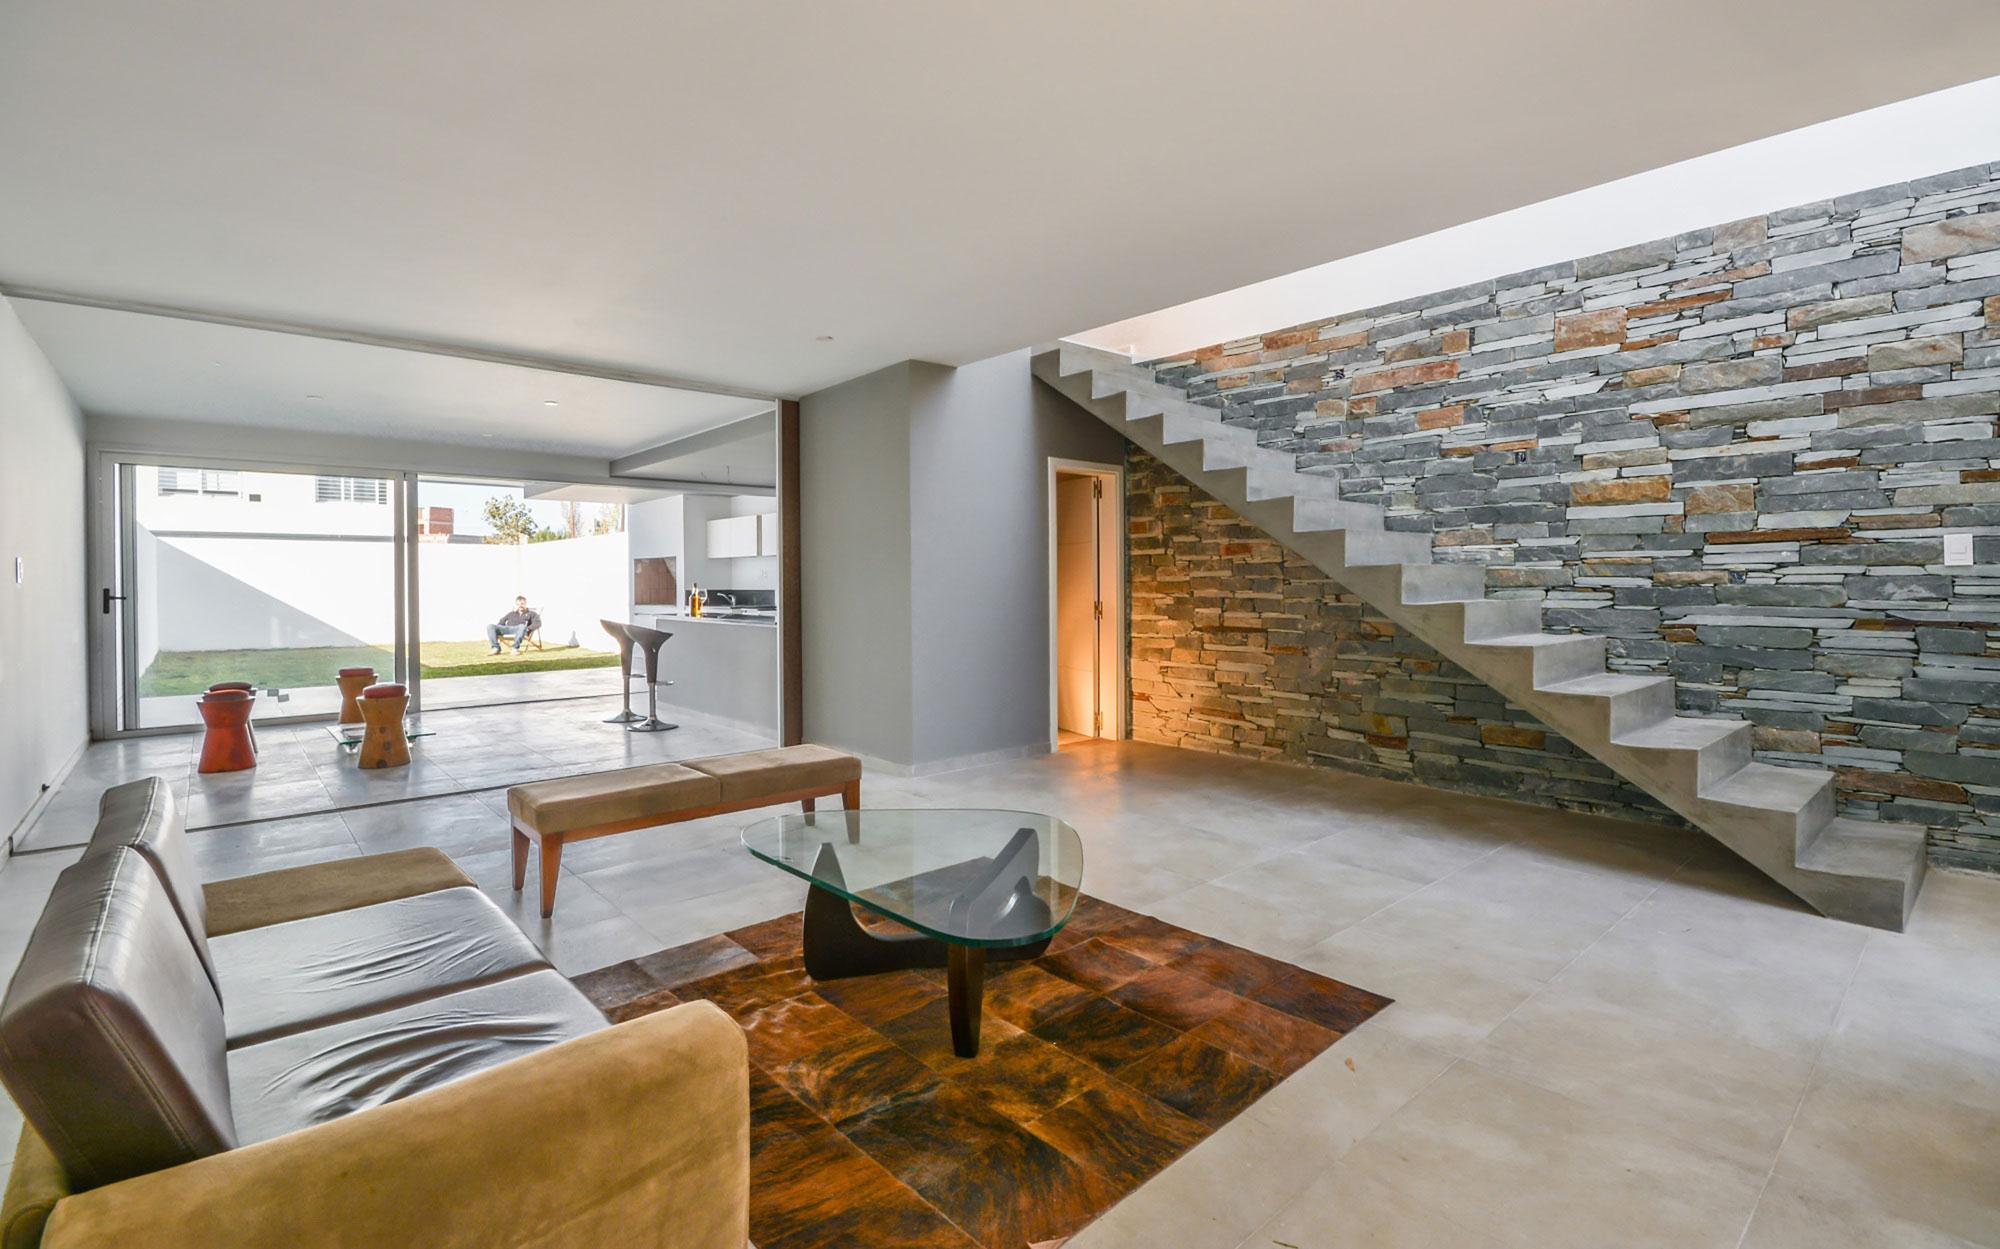 Terraced Houses-Estudio A+3-10